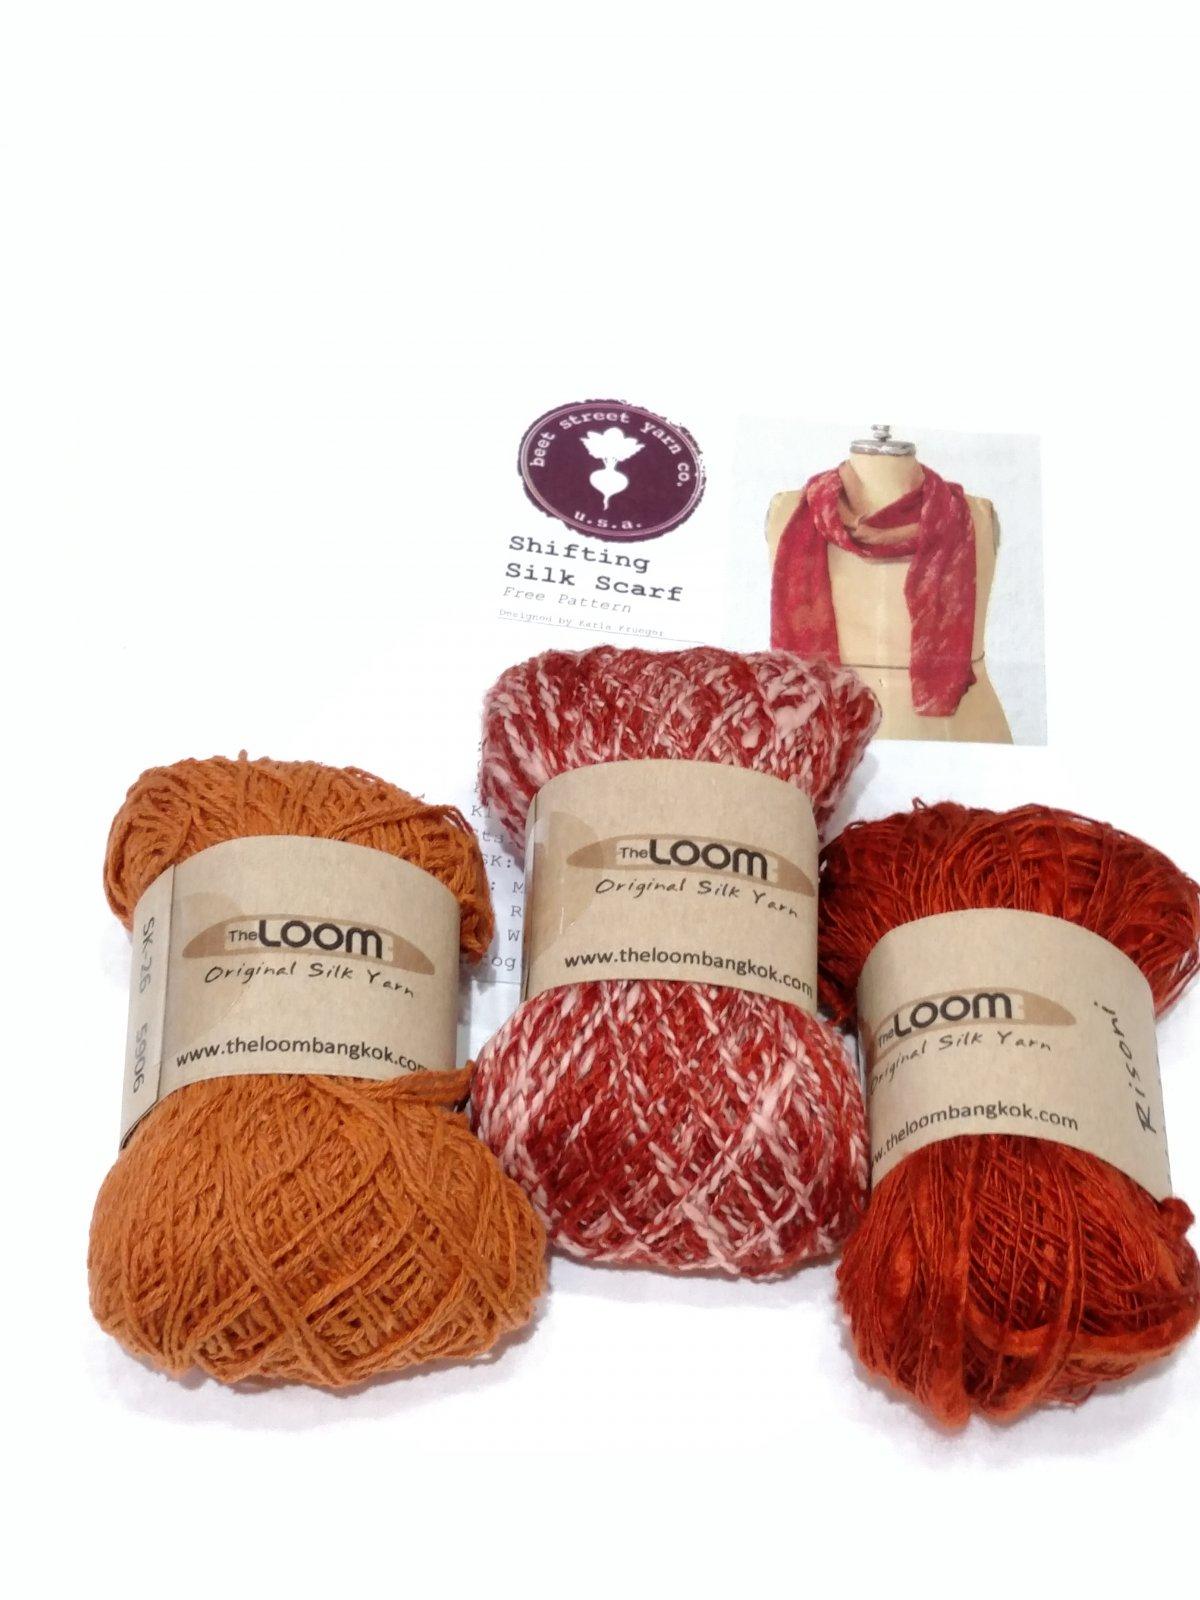 Loom Shifting Silk Scarf Kit